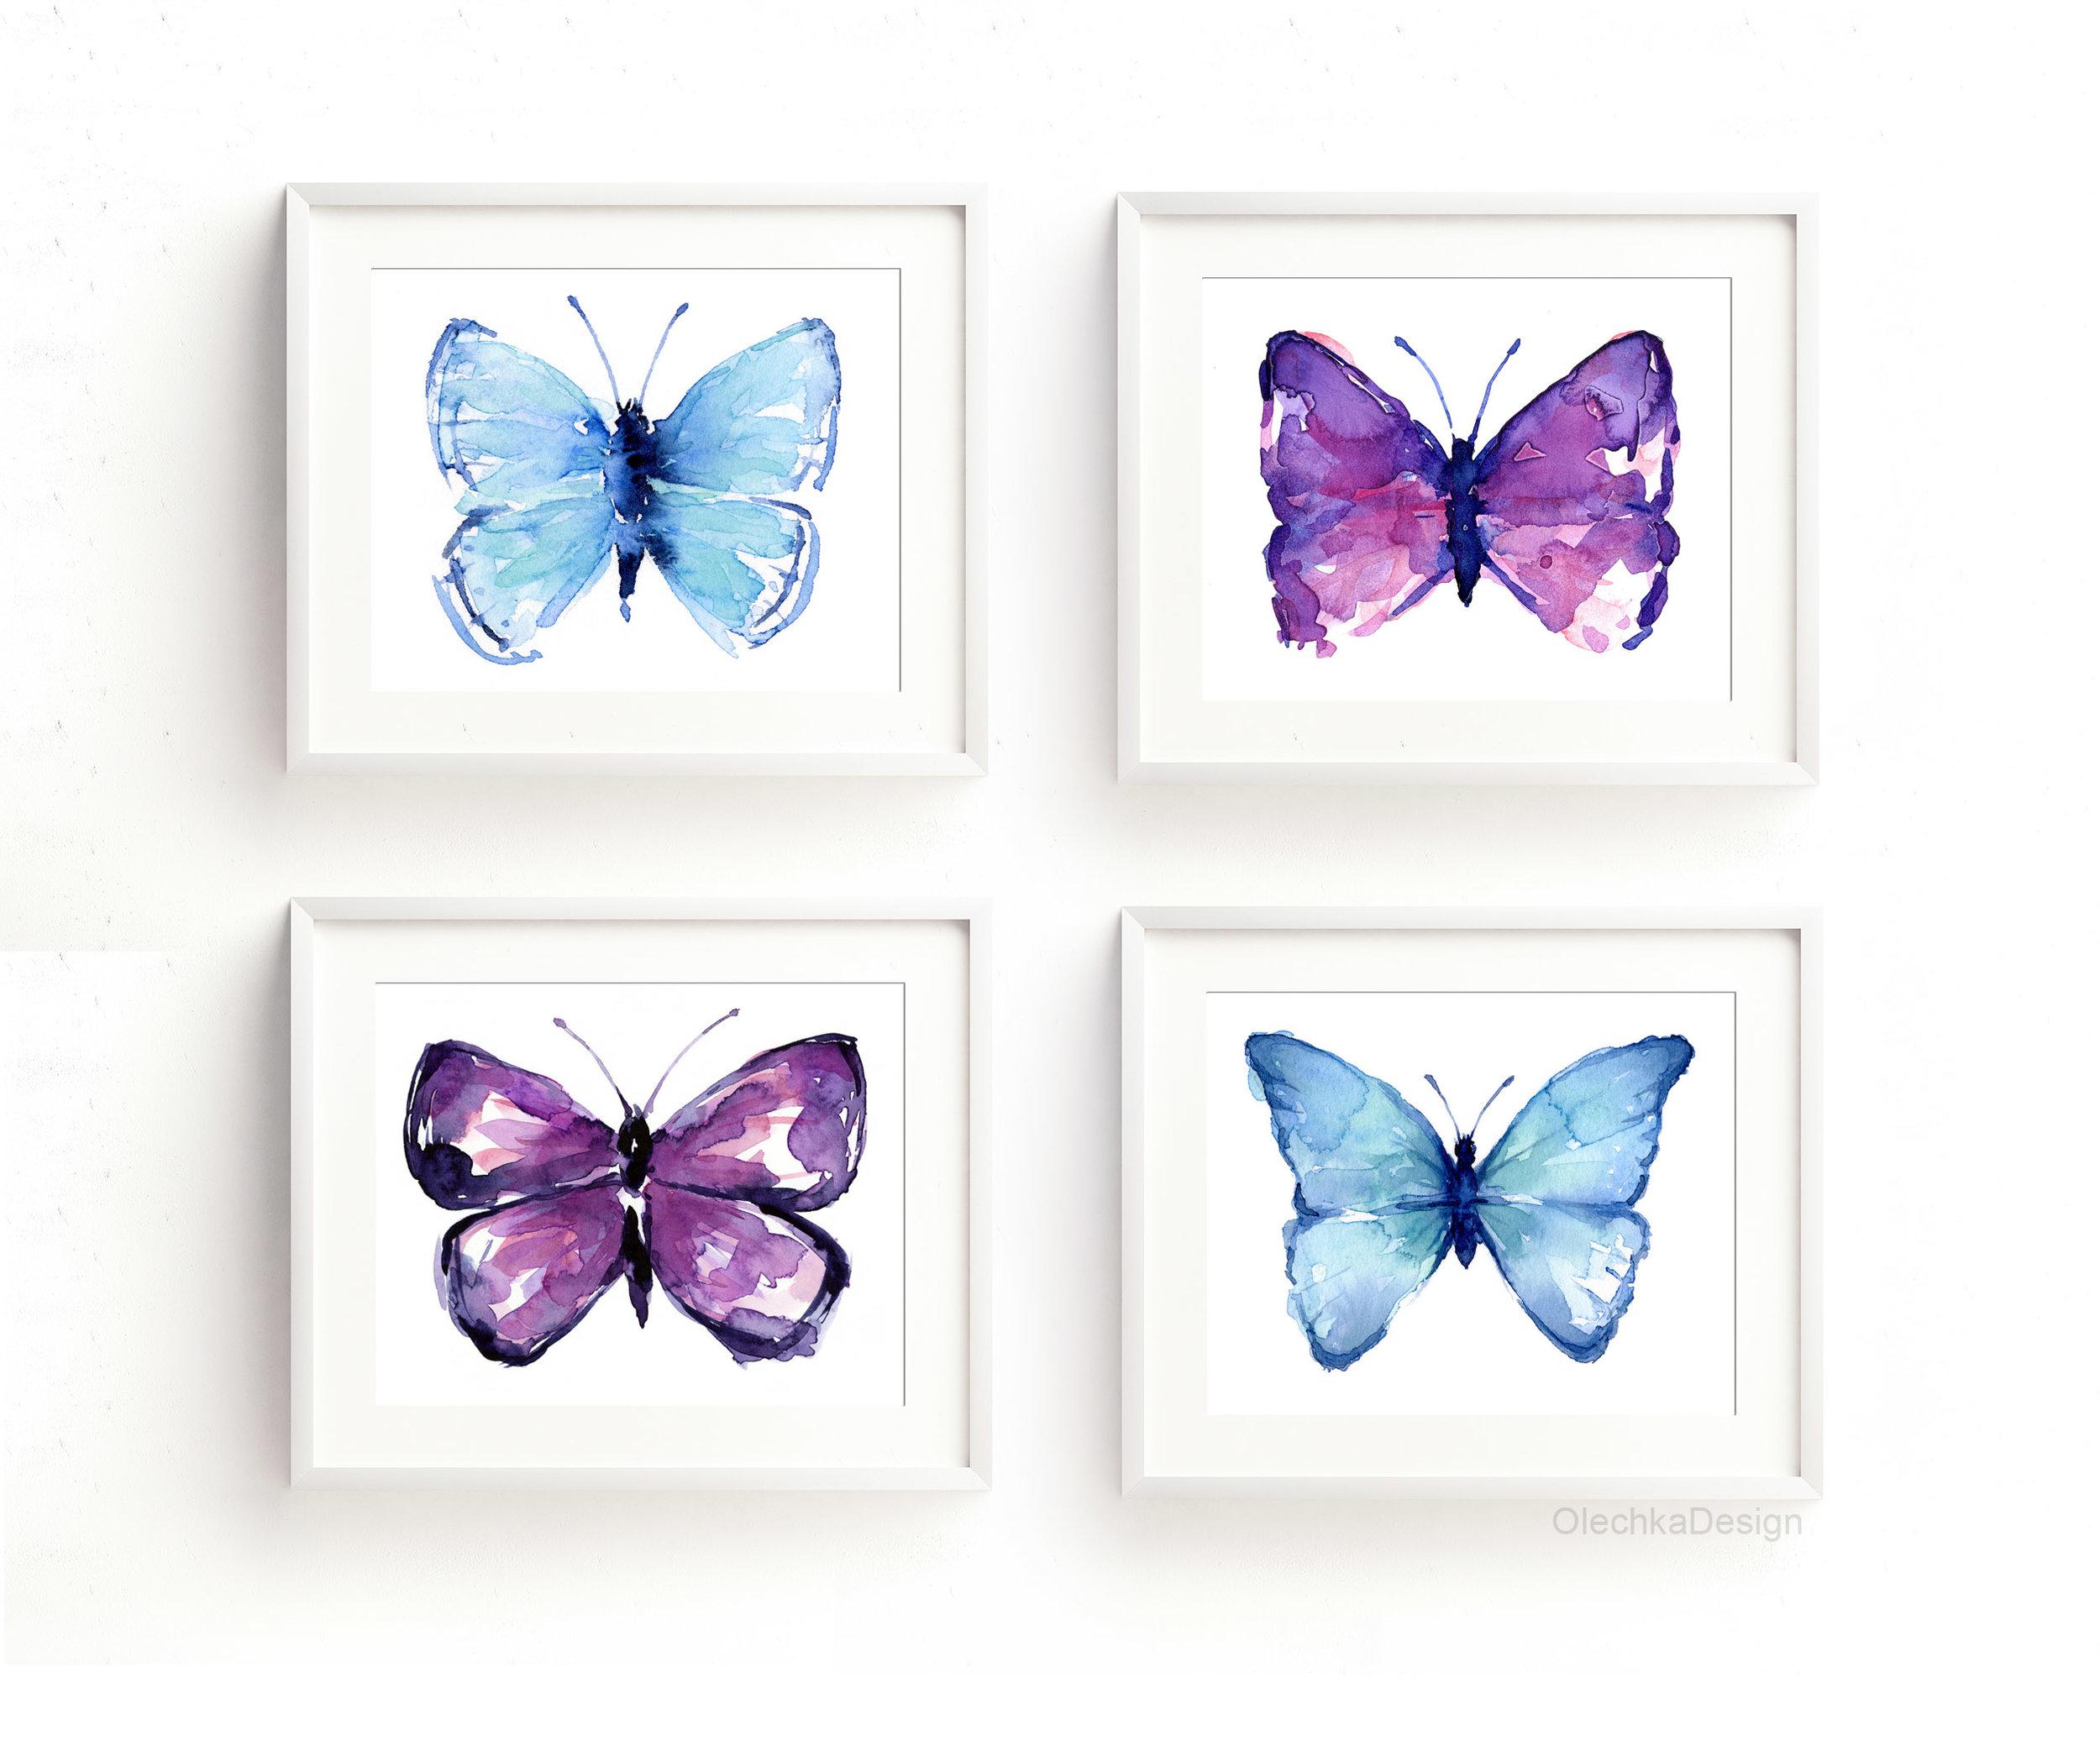 butterflies-blue-purple-butterfly-art-print-set.jpg